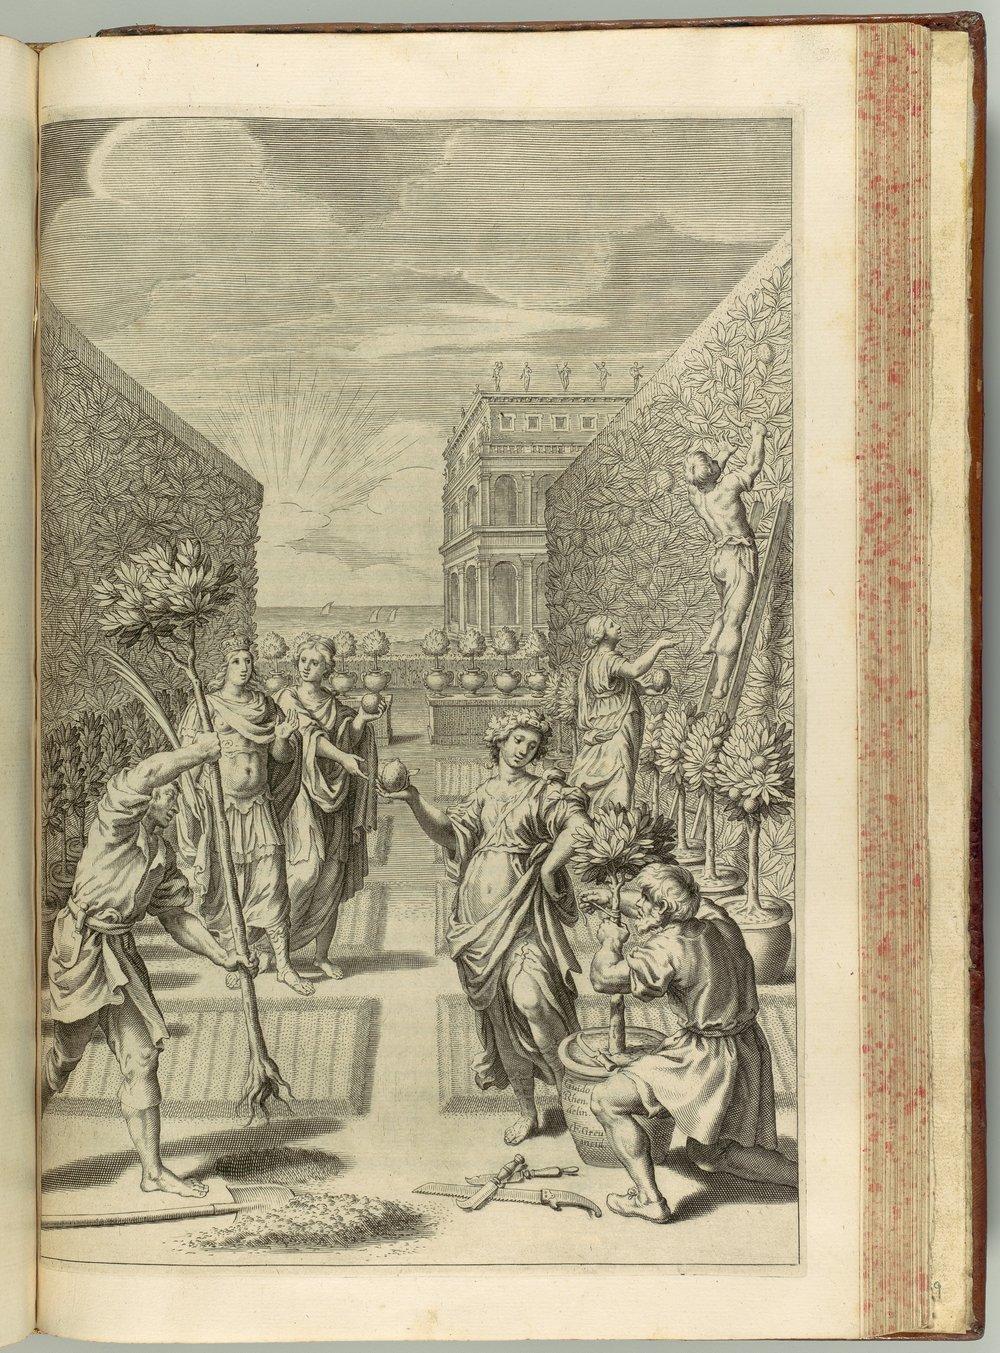 Hesperides sive de Malorum Aureorum cultura et usu. Libri Quatuor by Giovanni Battista